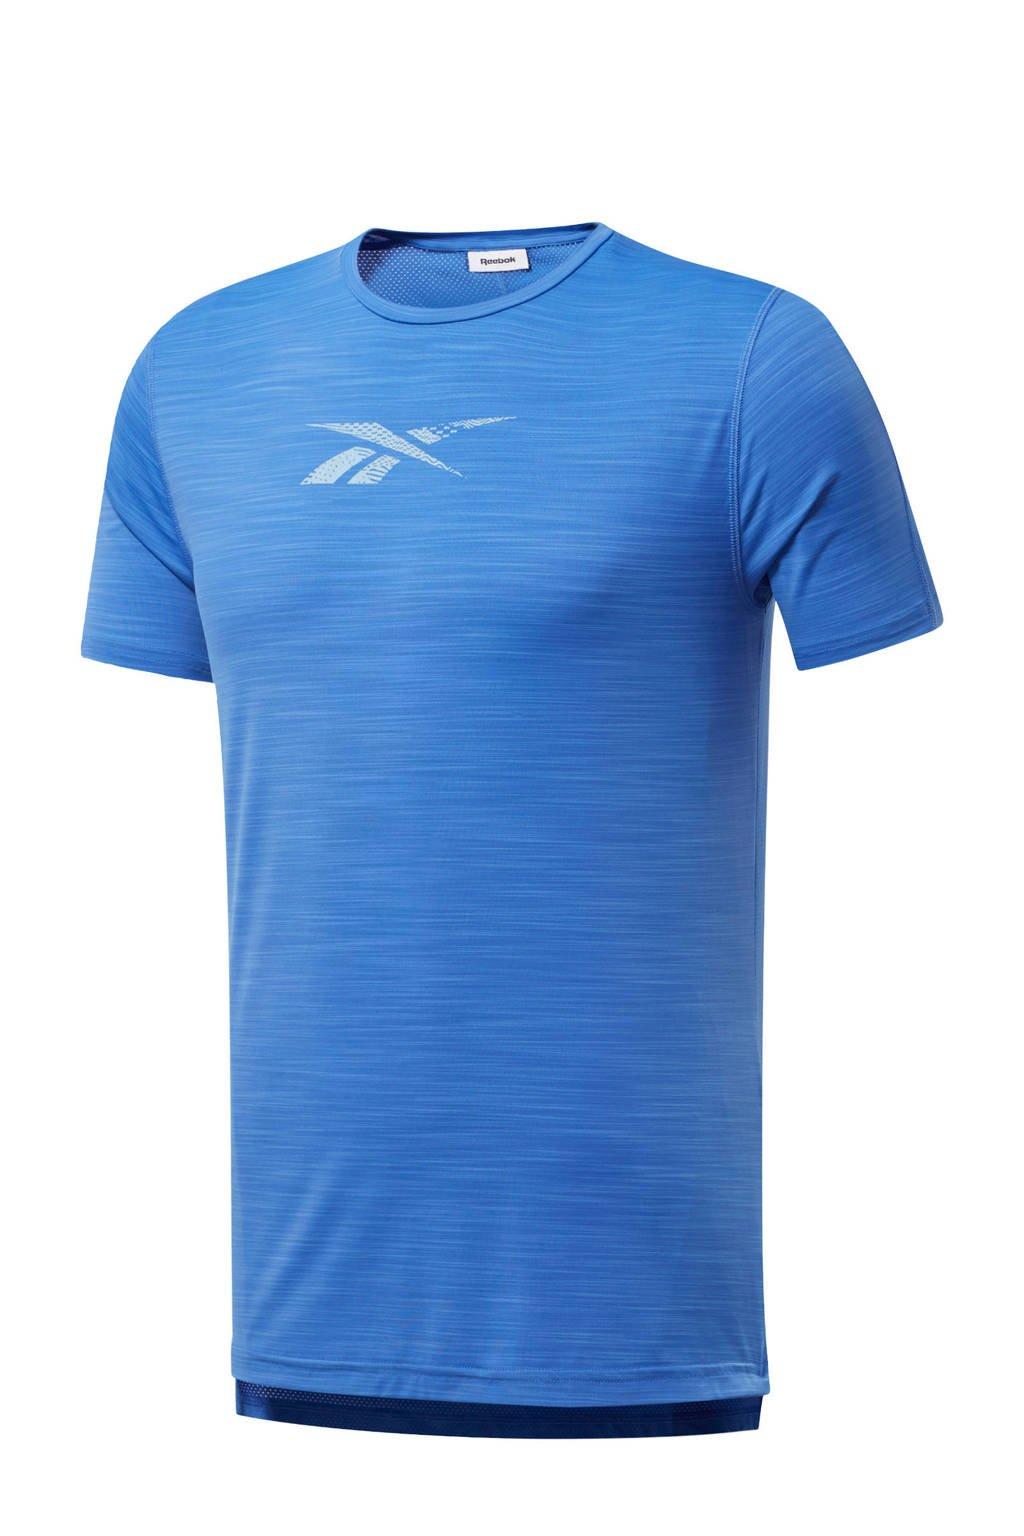 Reebok   sport T-shirt blauw, Blauw